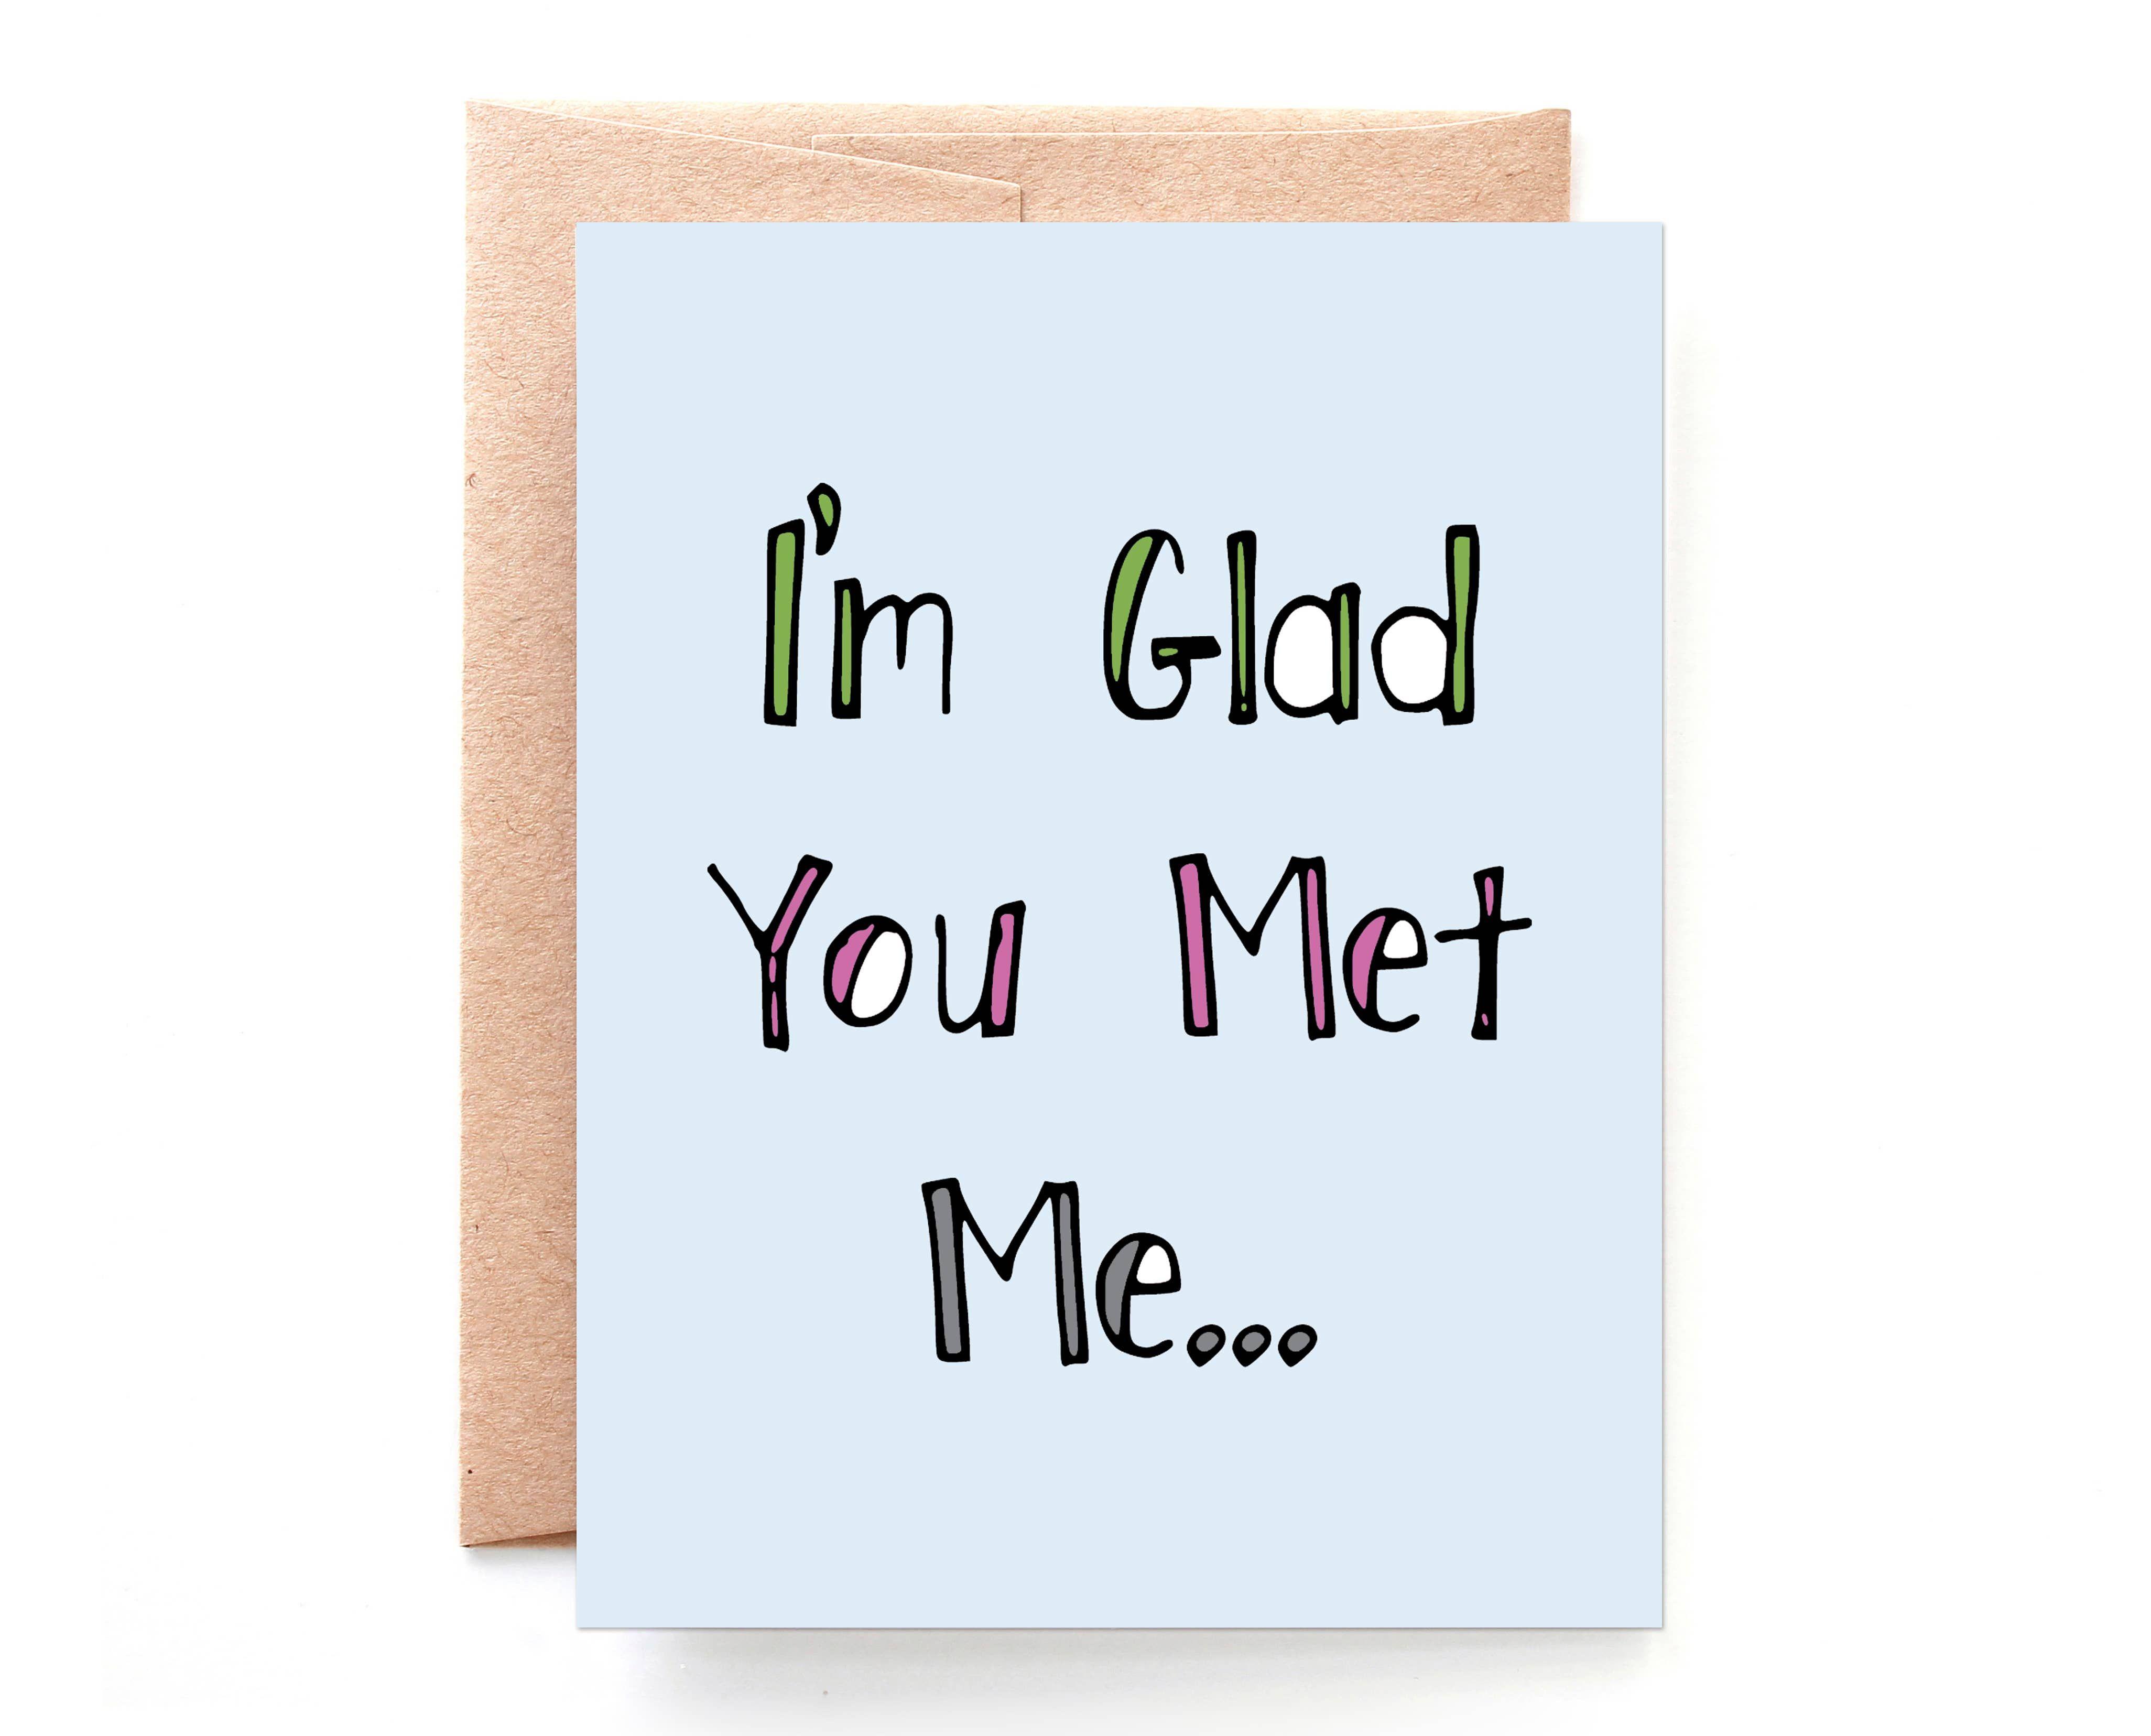 Wholesale Glad You Met Me Anniversary Card In 2021 Funny Anniversary Cards Anniversary Funny Love Cards